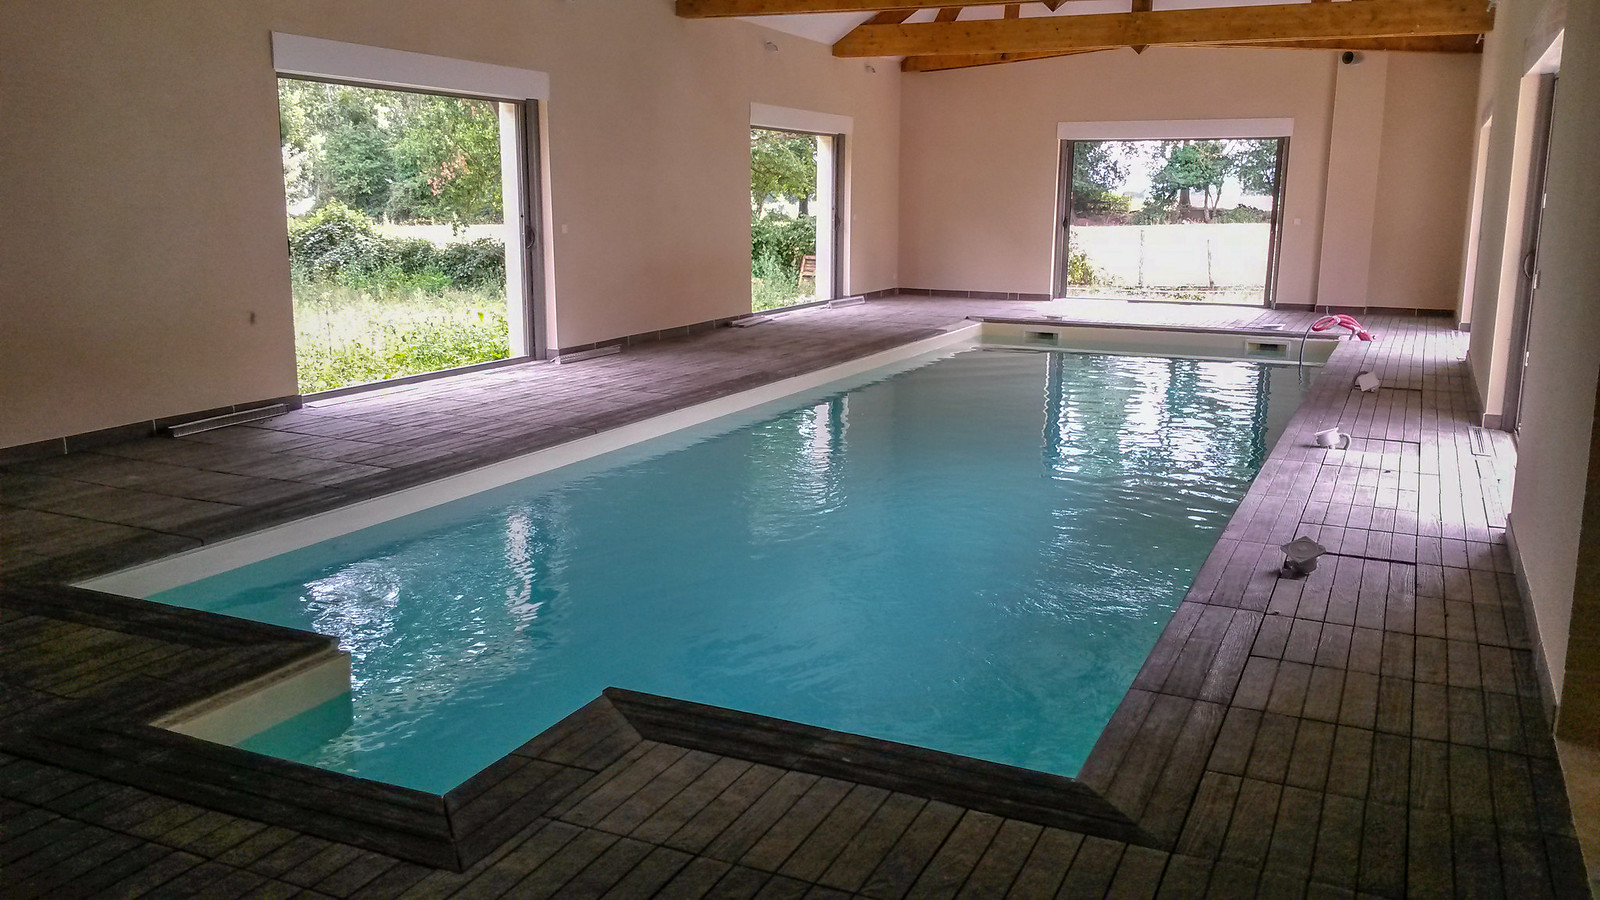 Piscines Es & Spas realisation-piscines-et-spas-du-perche-23   piscines hydro